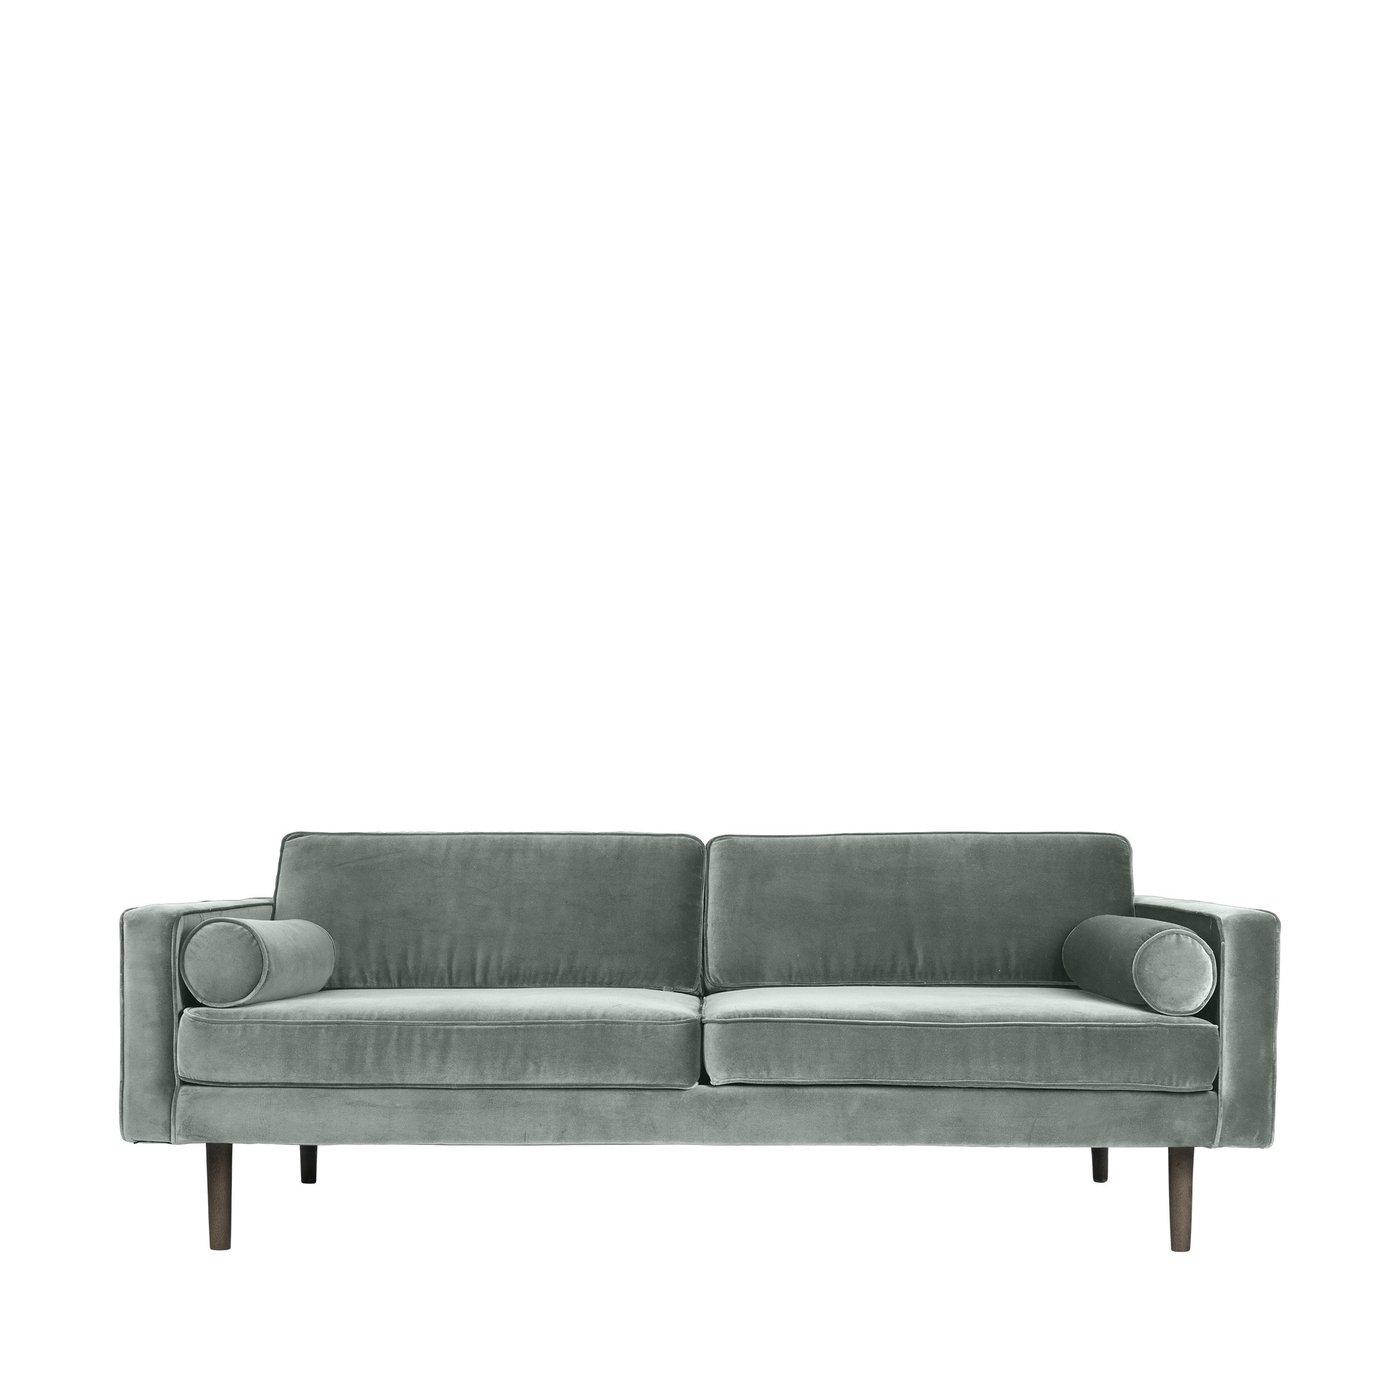 Wind Sofa Chinois Green - £1670.00 - Broste Copenhagen